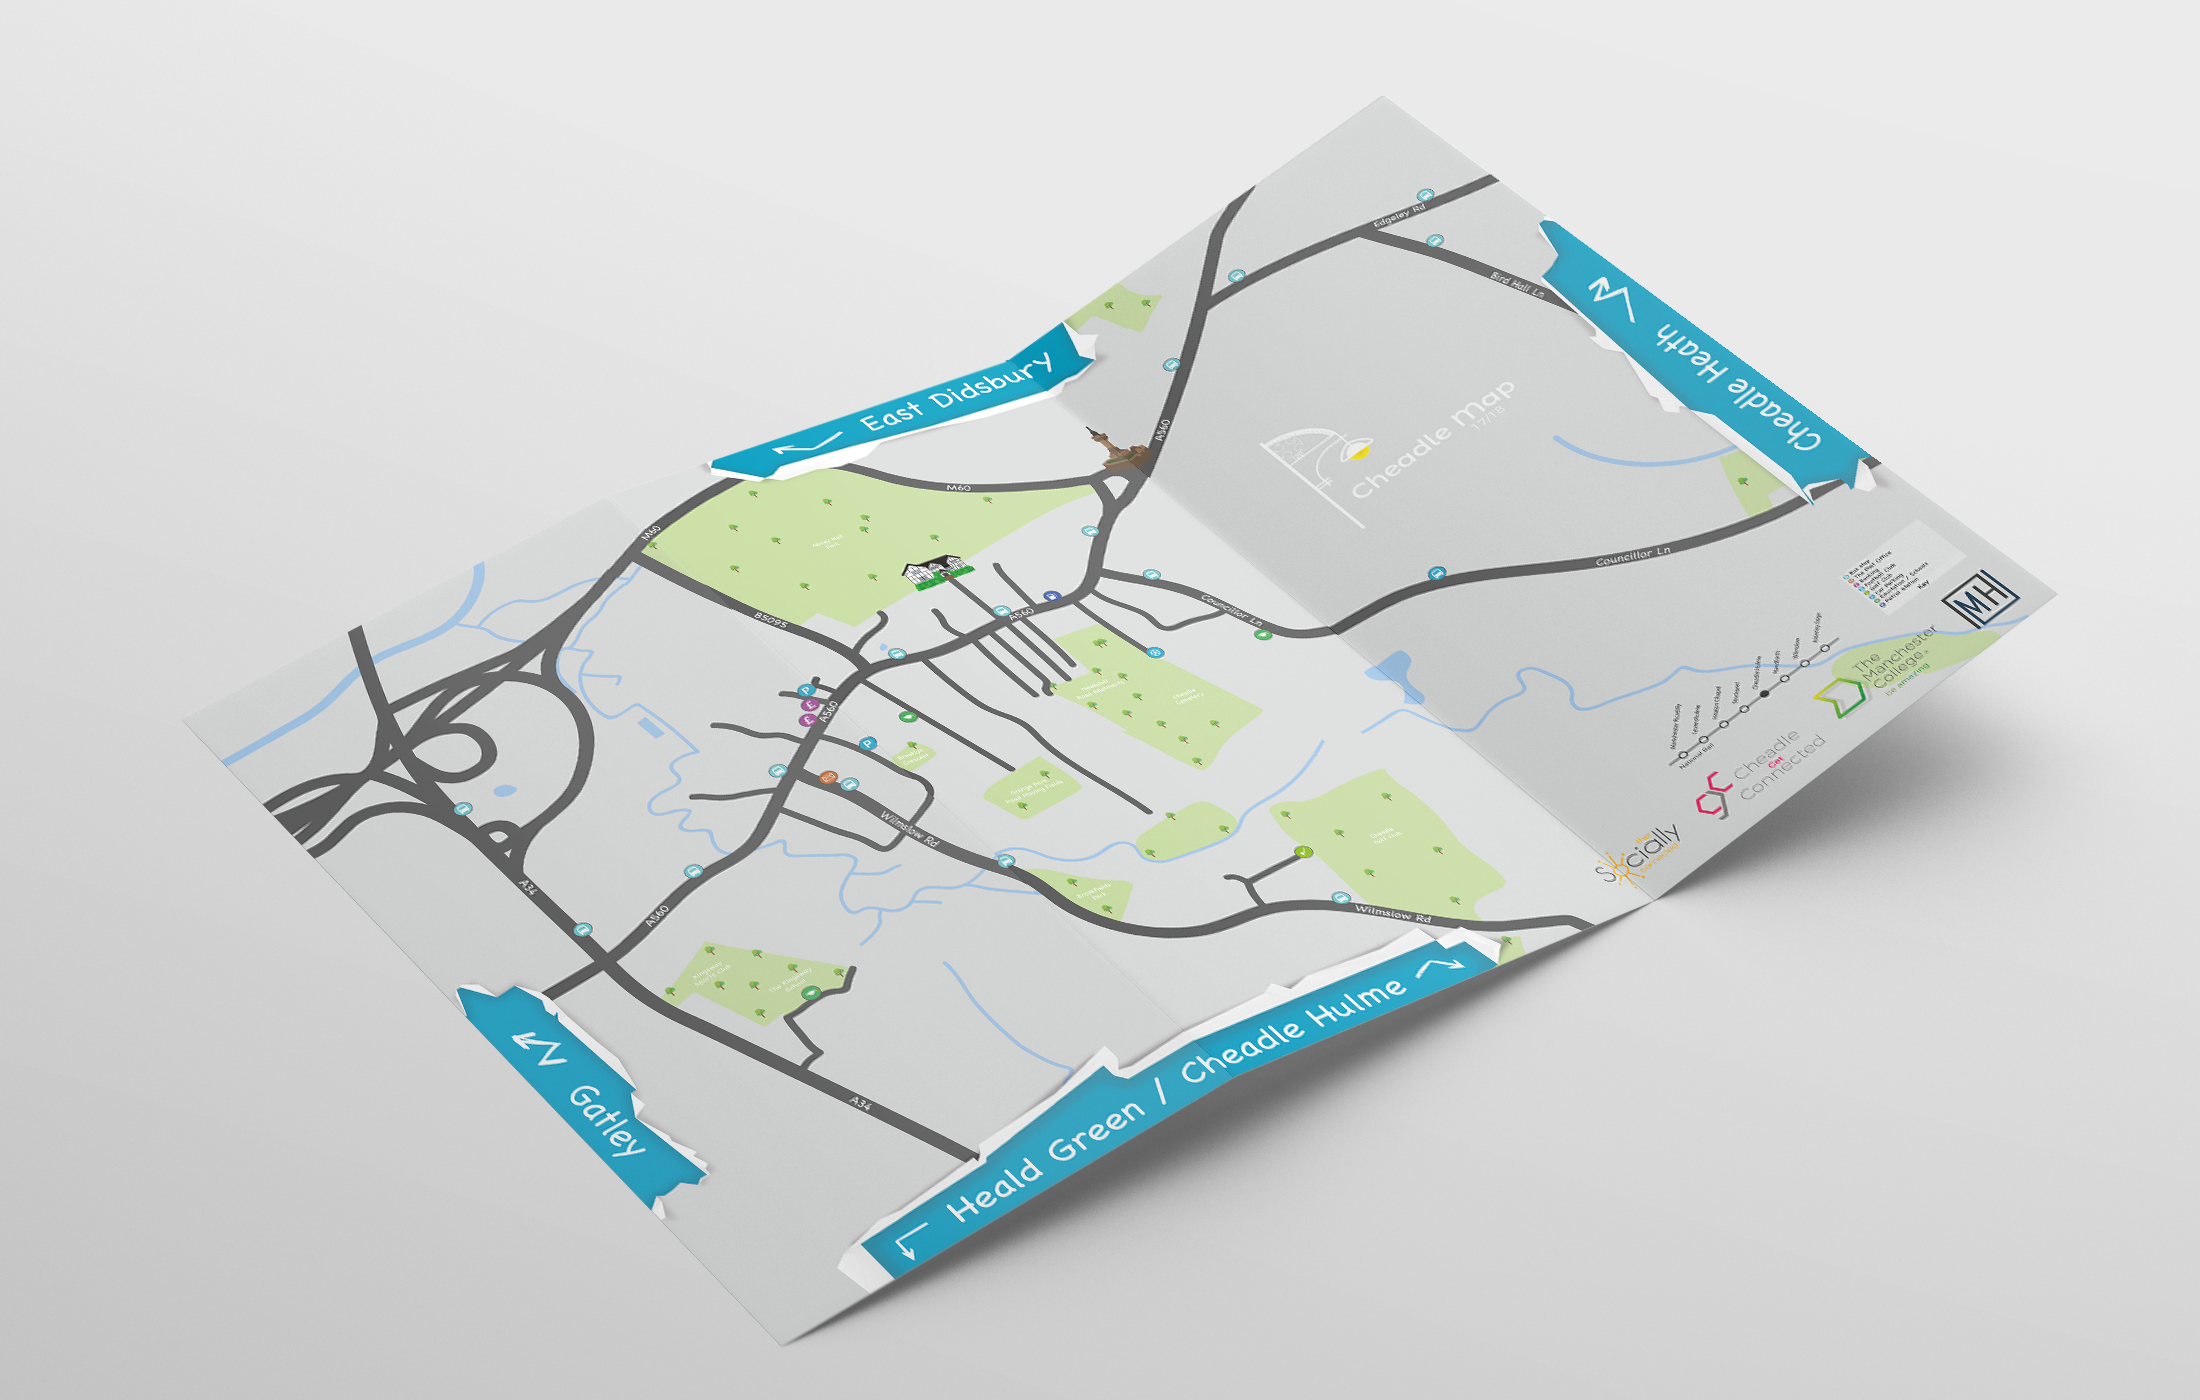 Cheadle Map & Branding